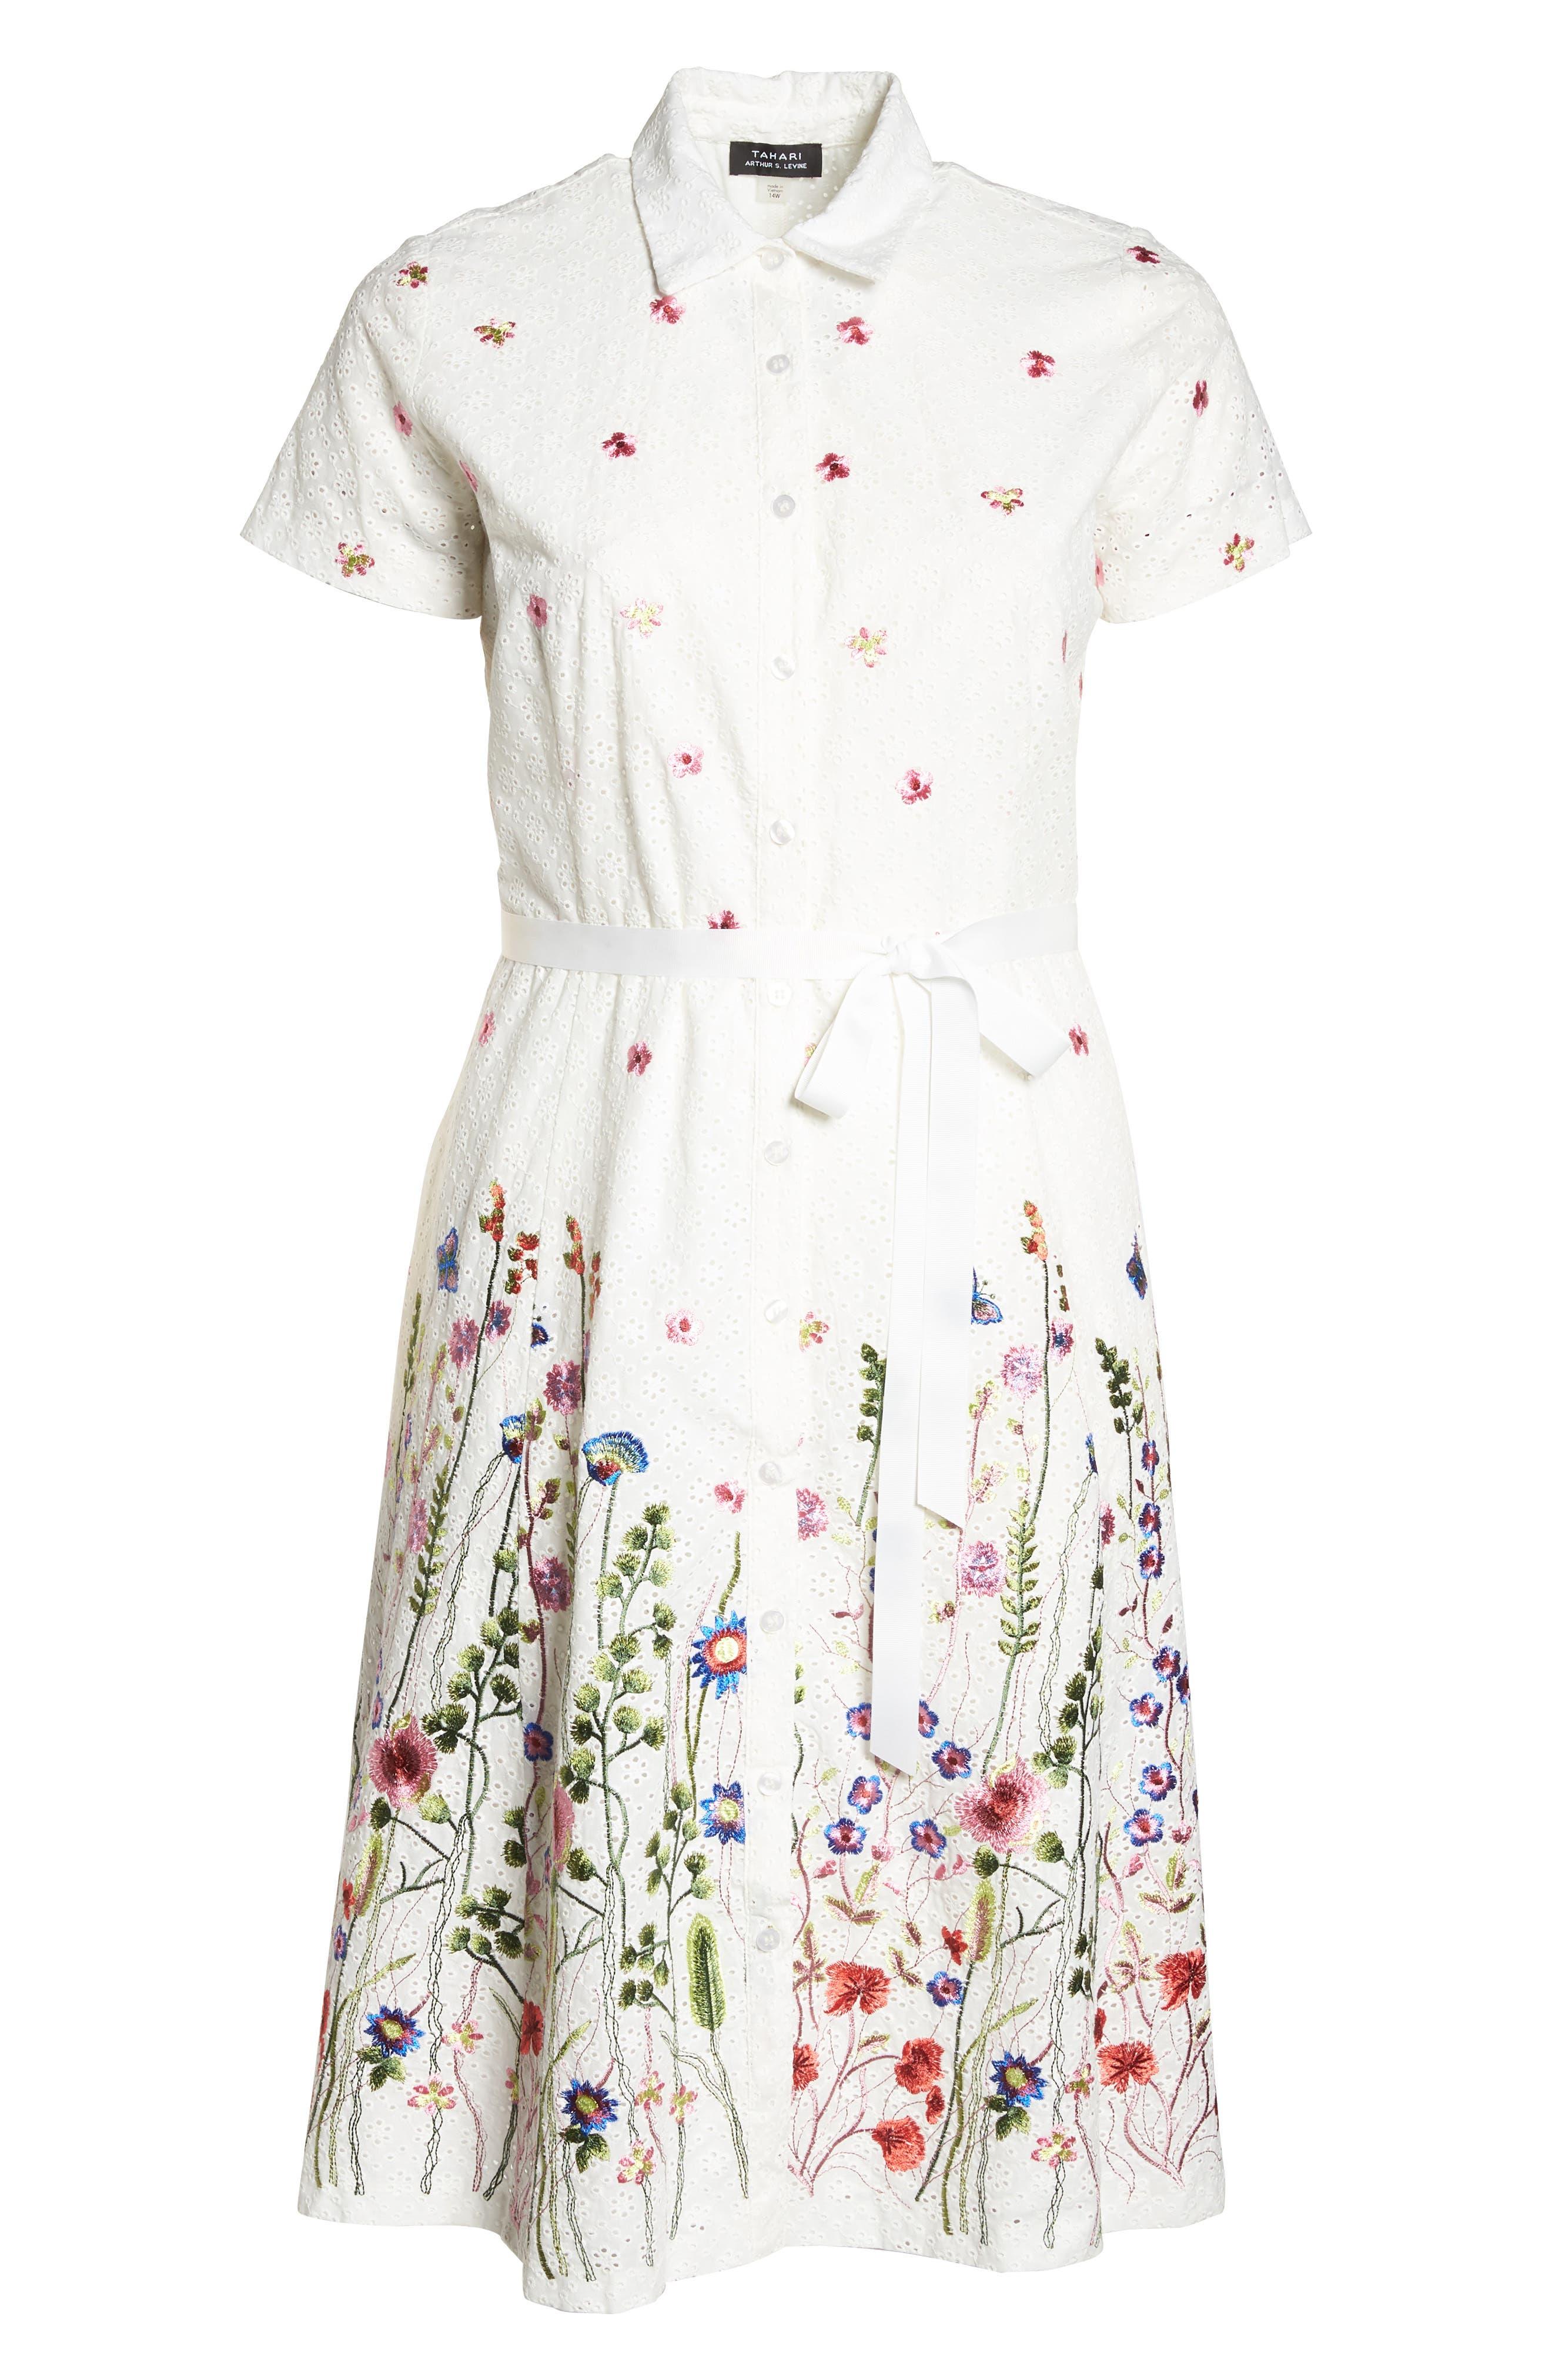 Floral Embroidered Eyelet Shirtdress,                             Alternate thumbnail 6, color,                             White/ Royal/ Green